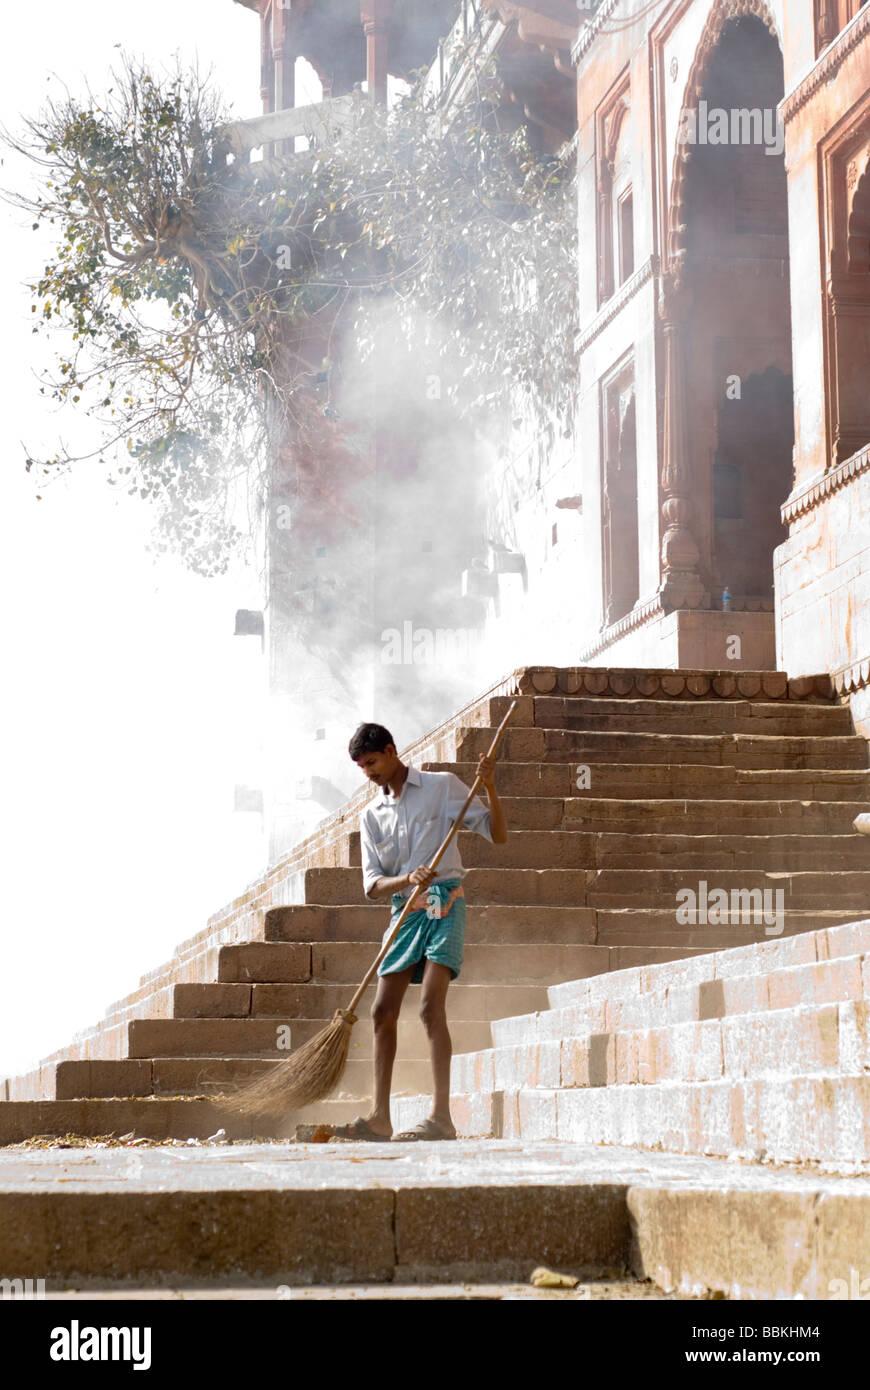 Low caste man sweeping a bathing ghat in Varanasi, India. - Stock Image